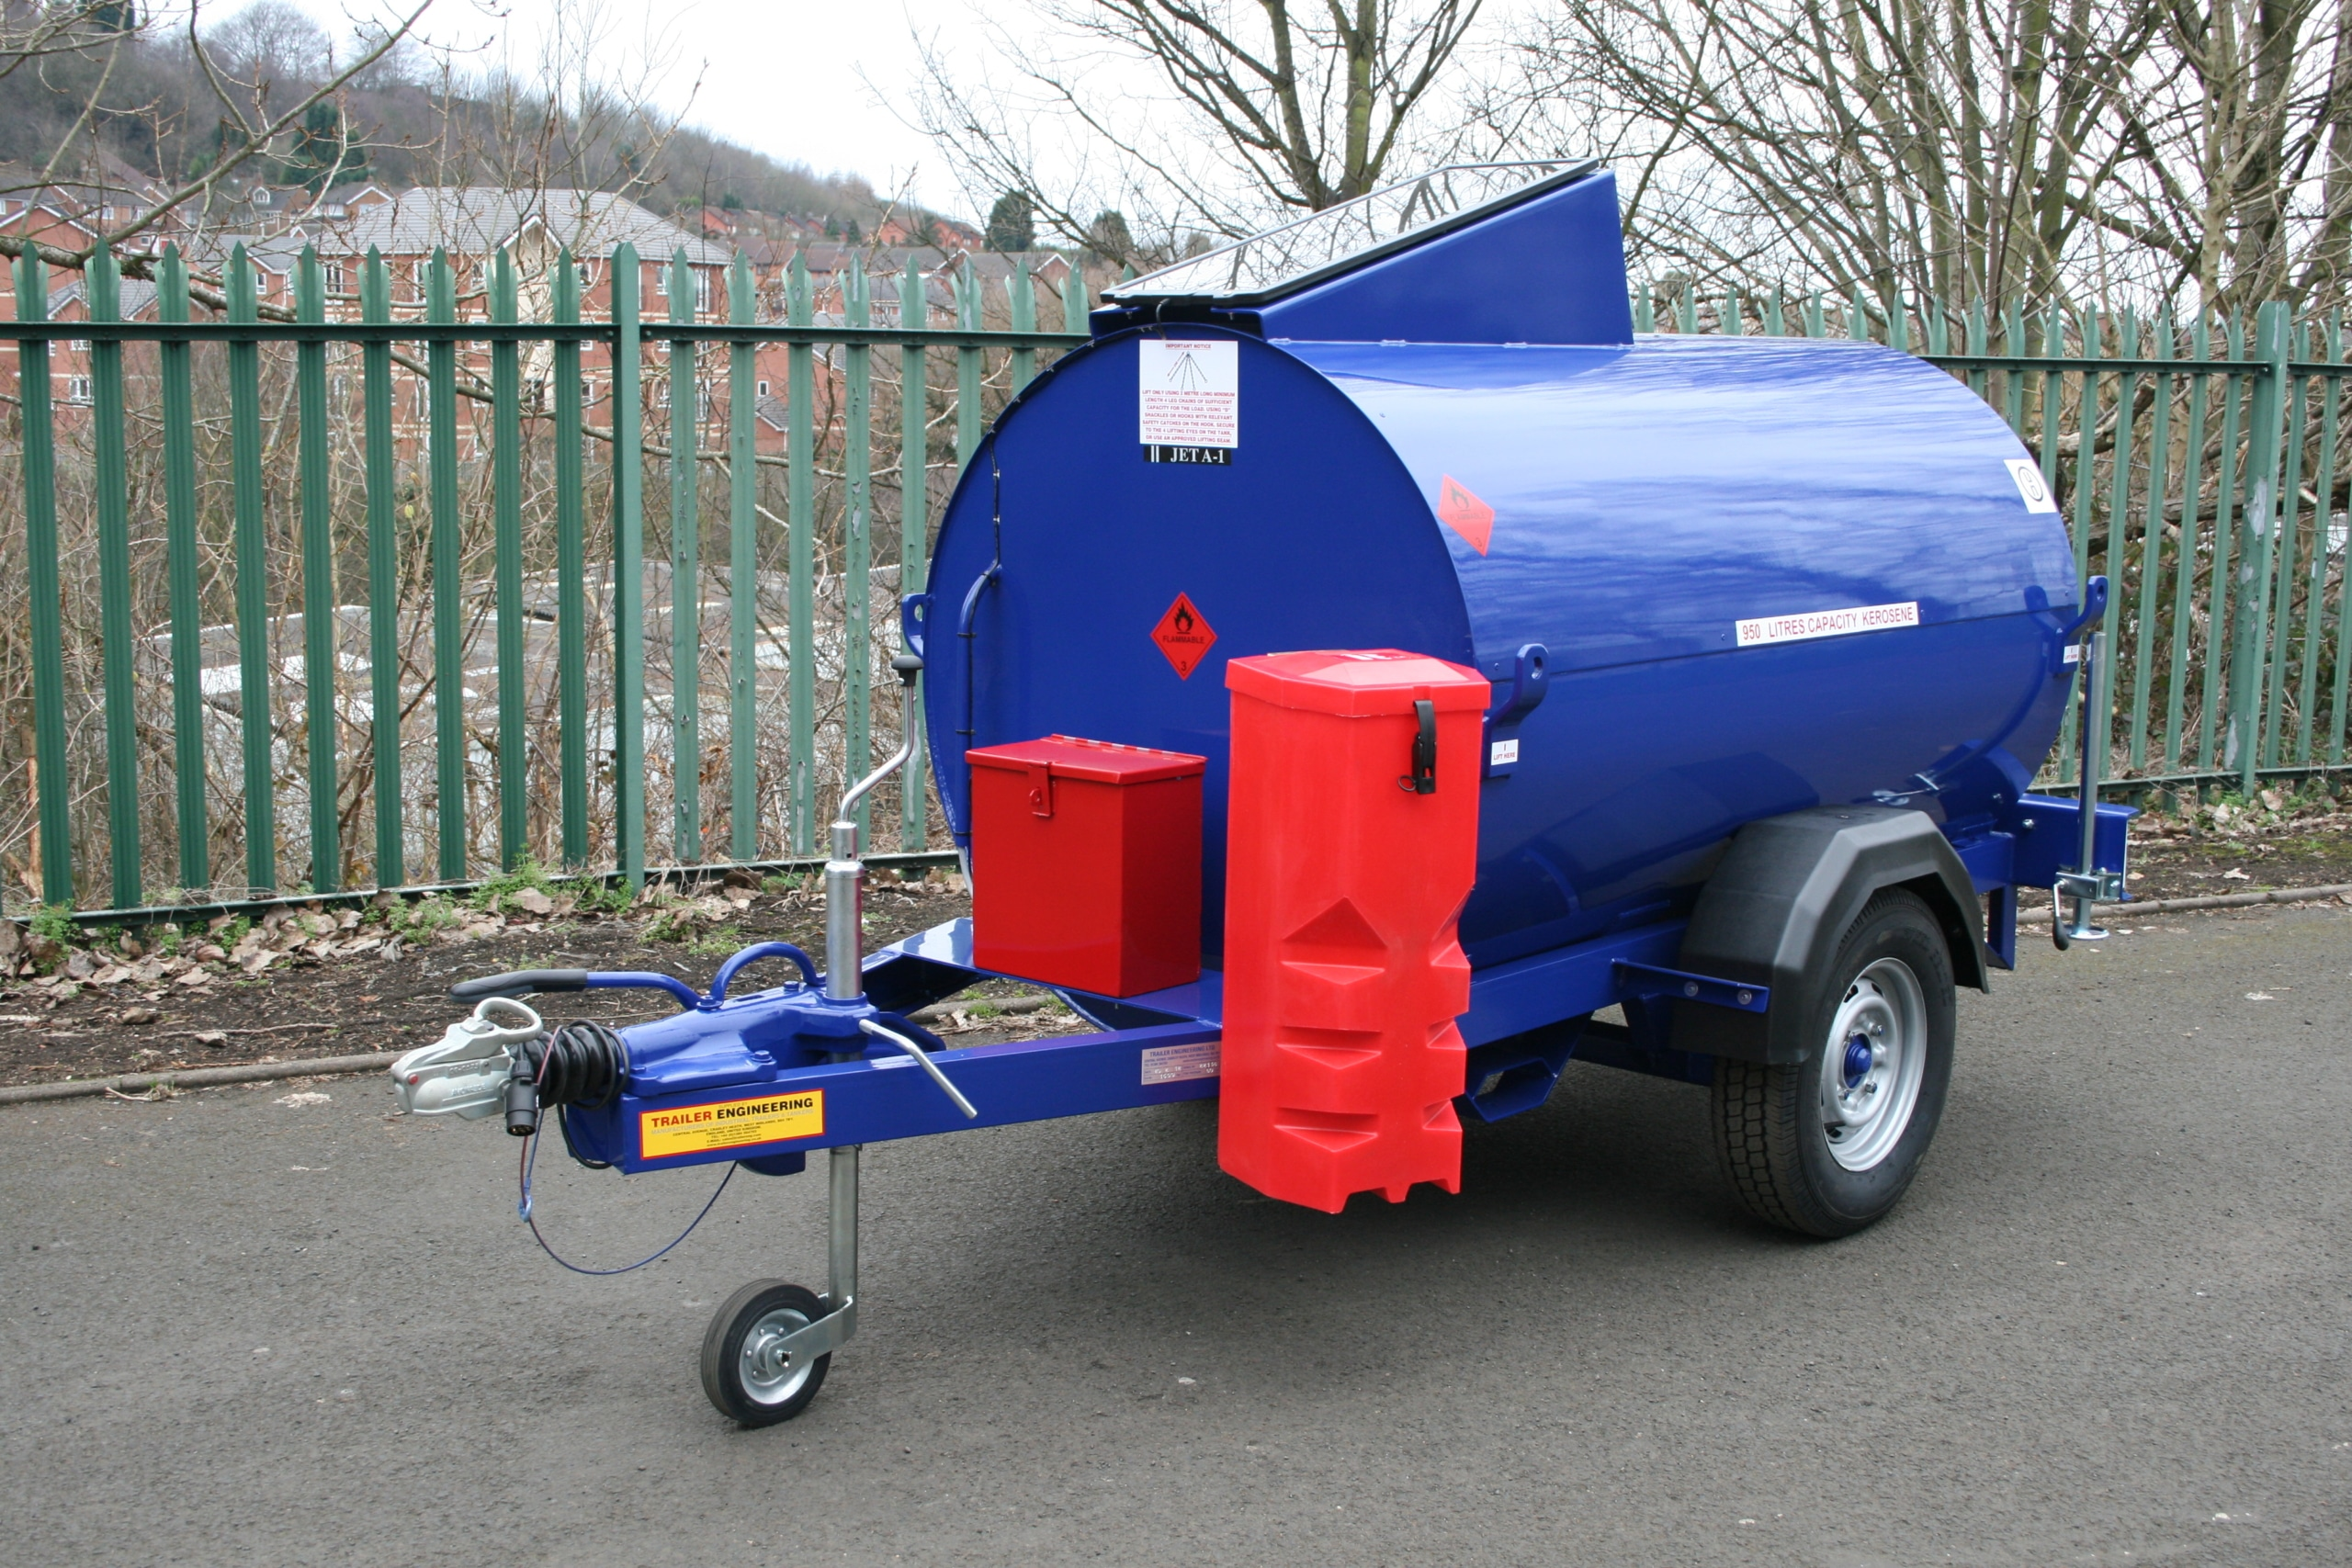 JetA1 fuel trailer with solar panels